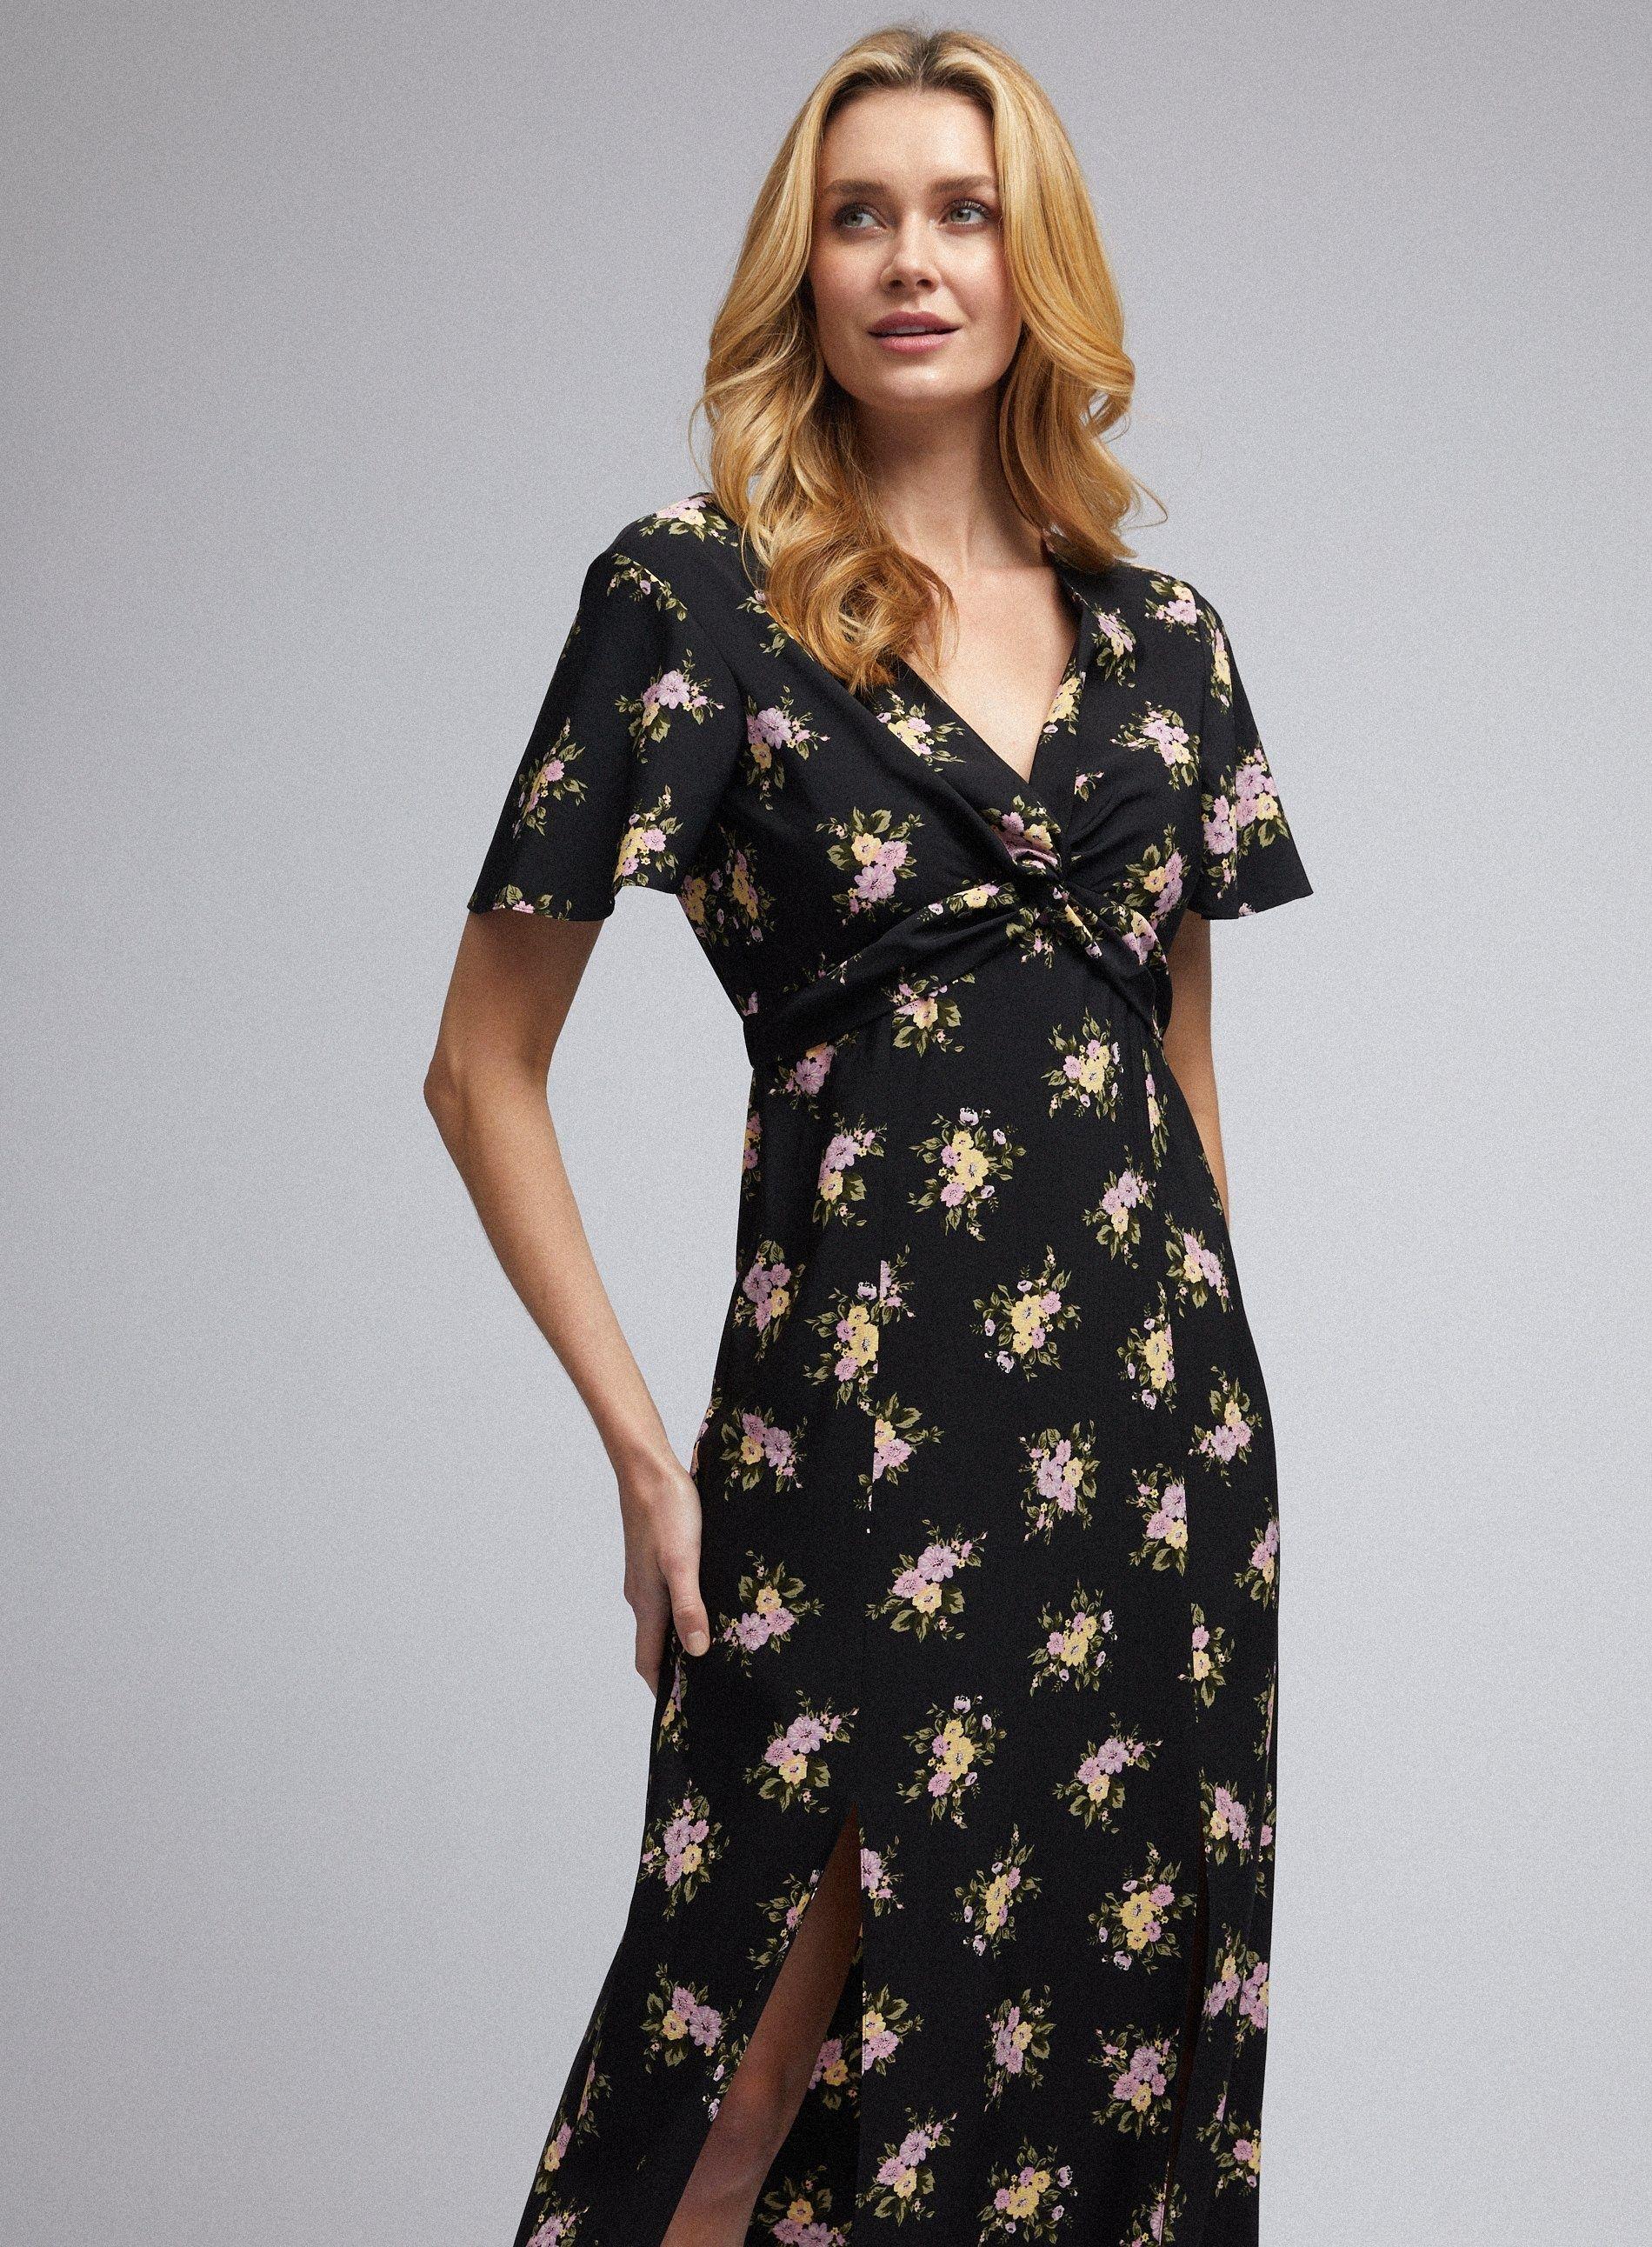 Dorothy Perkins Womens Black Floral Print Tea Midi Dress V-Neck Short Sleeve